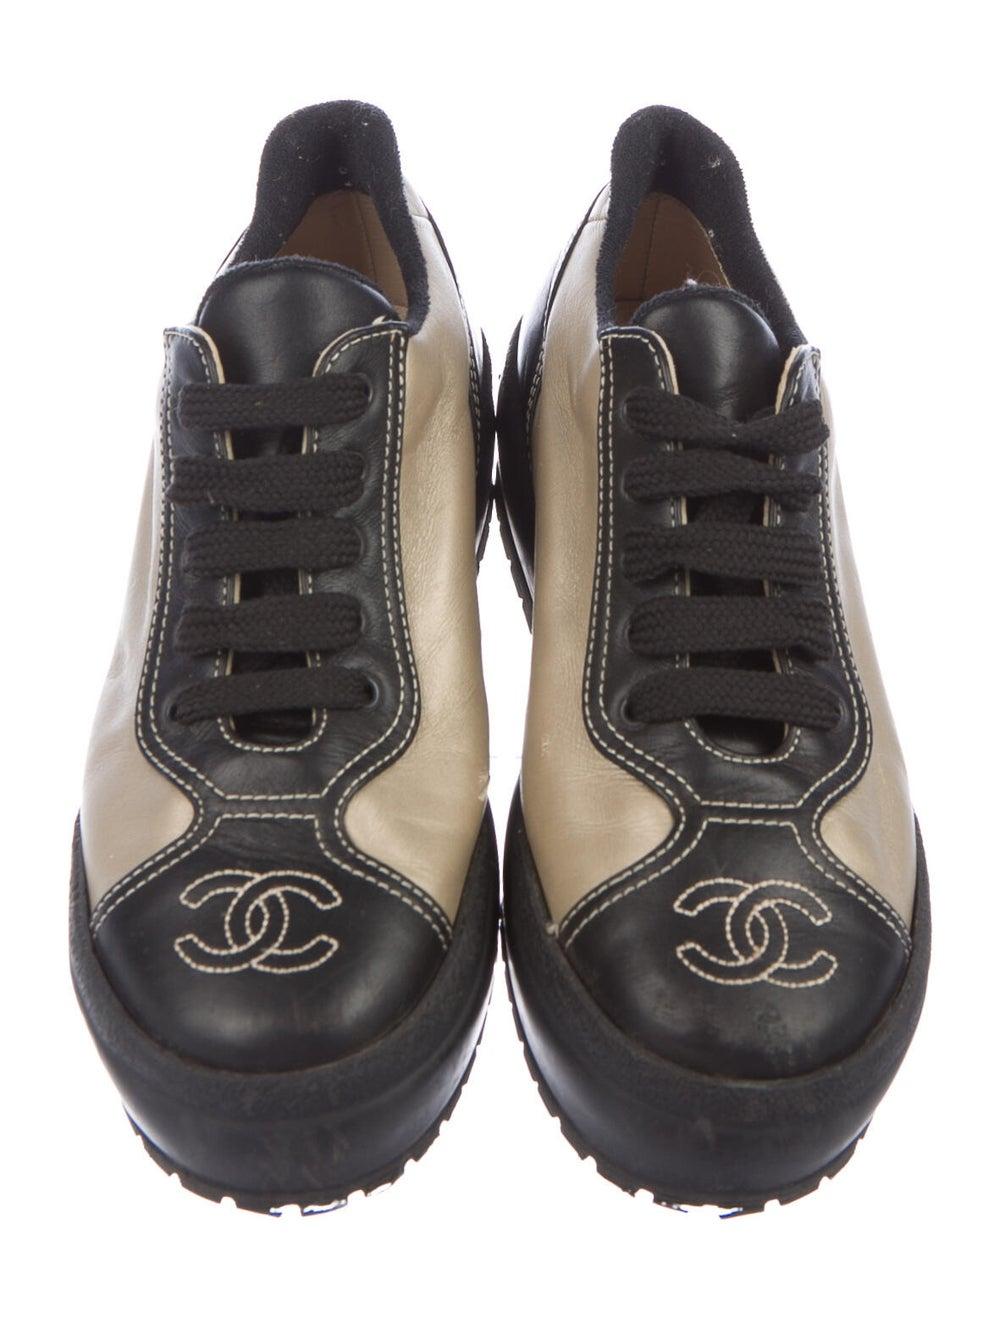 Chanel Interlocking CC Logo Leather Sneakers - image 3